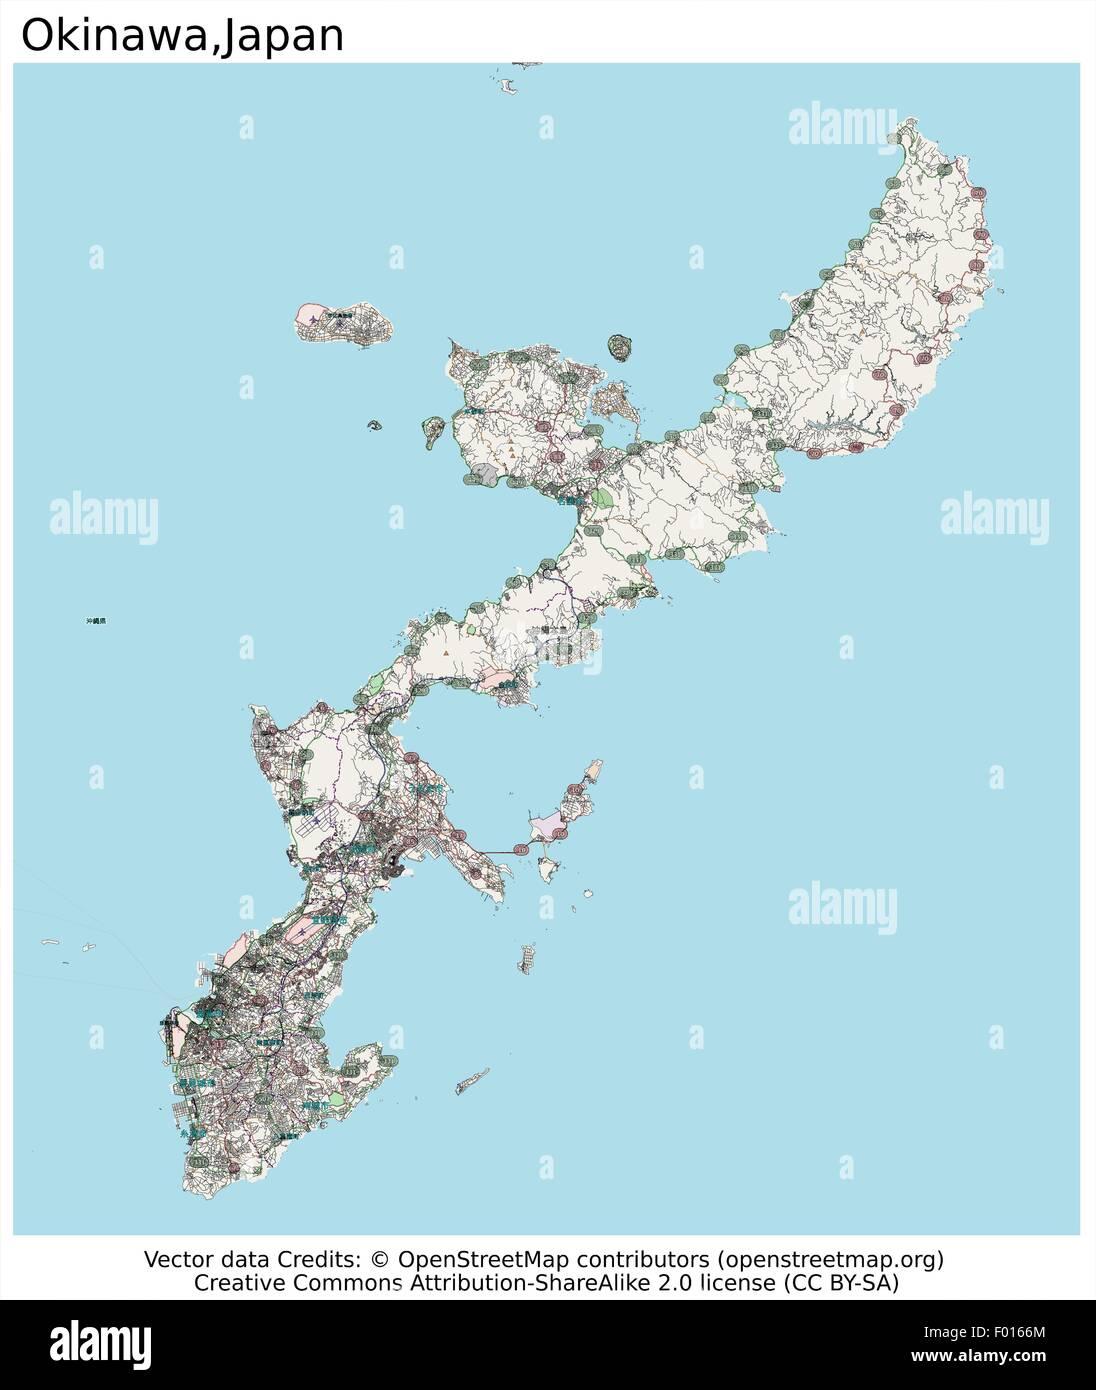 Okinawa island japan city map aerial view stock vector art okinawa island japan city map aerial view gumiabroncs Choice Image